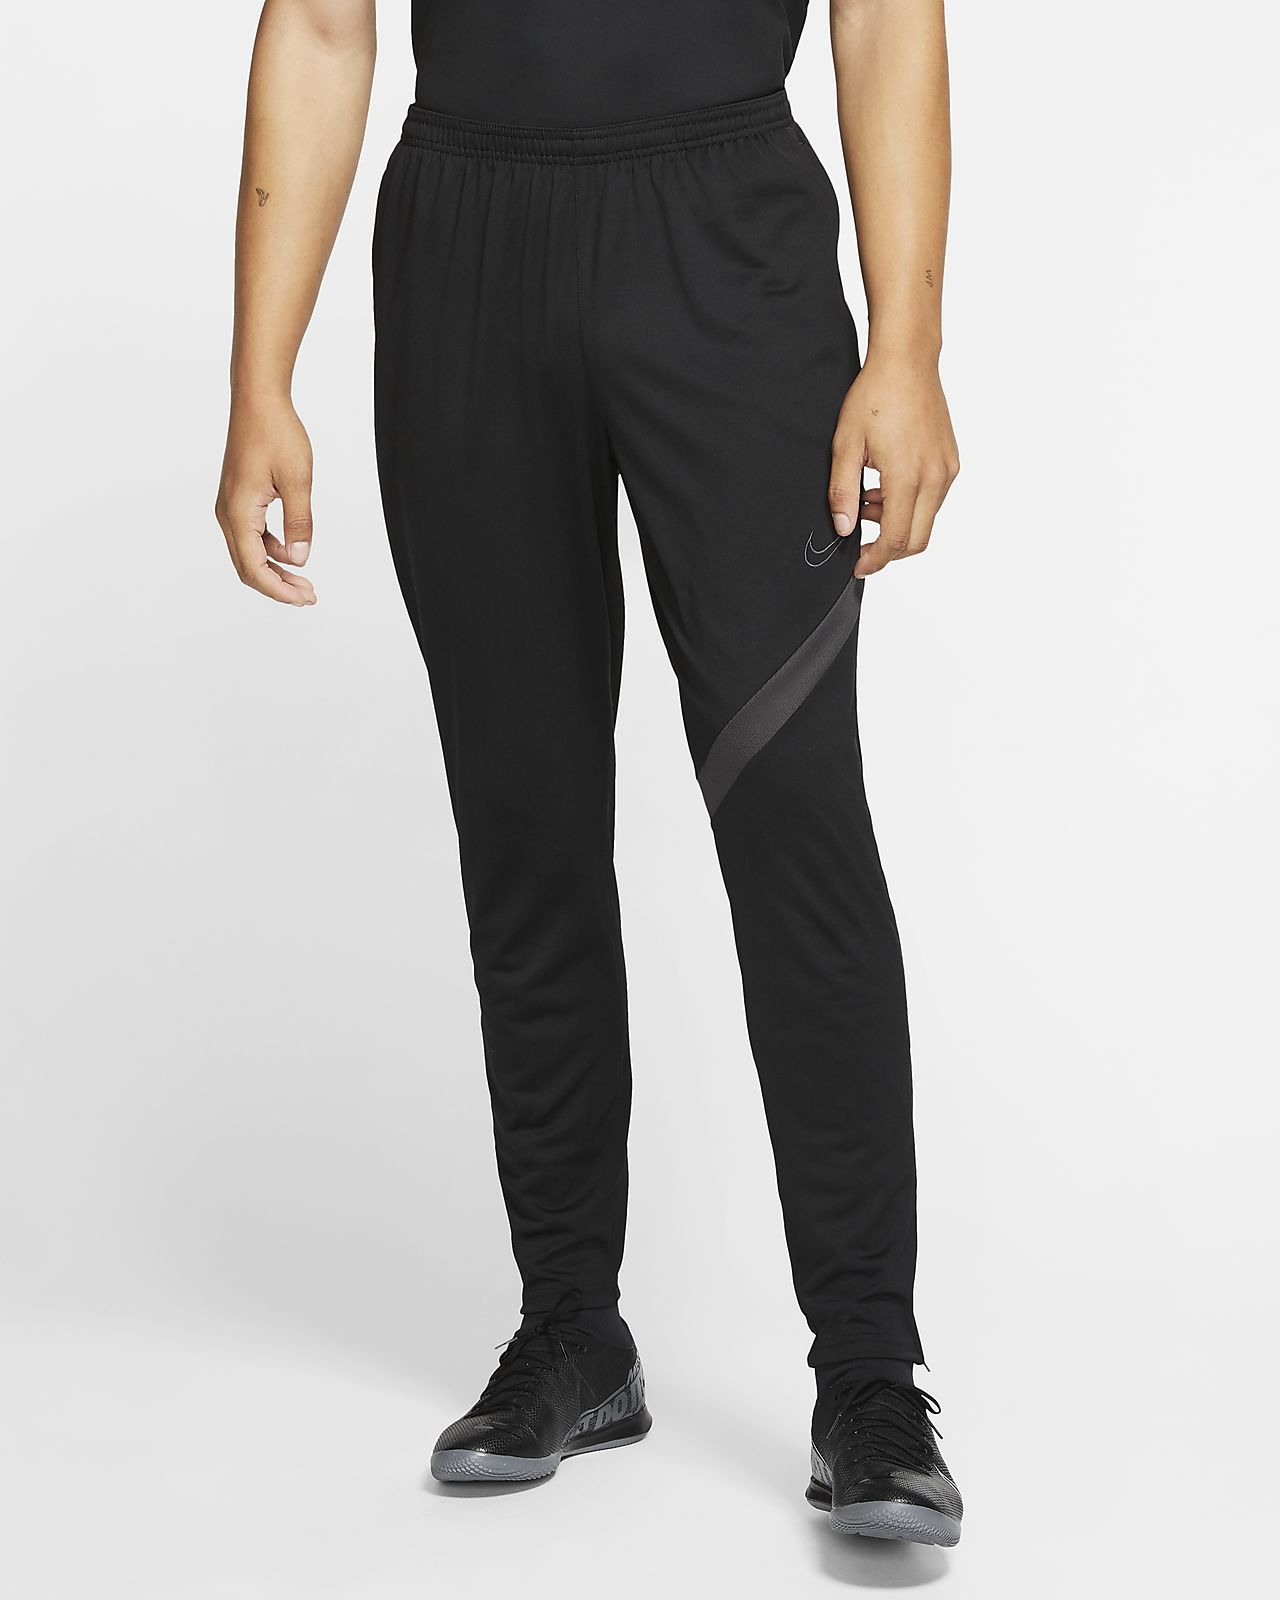 Nike Dri-FIT Academy Pro Men's Soccer Pants